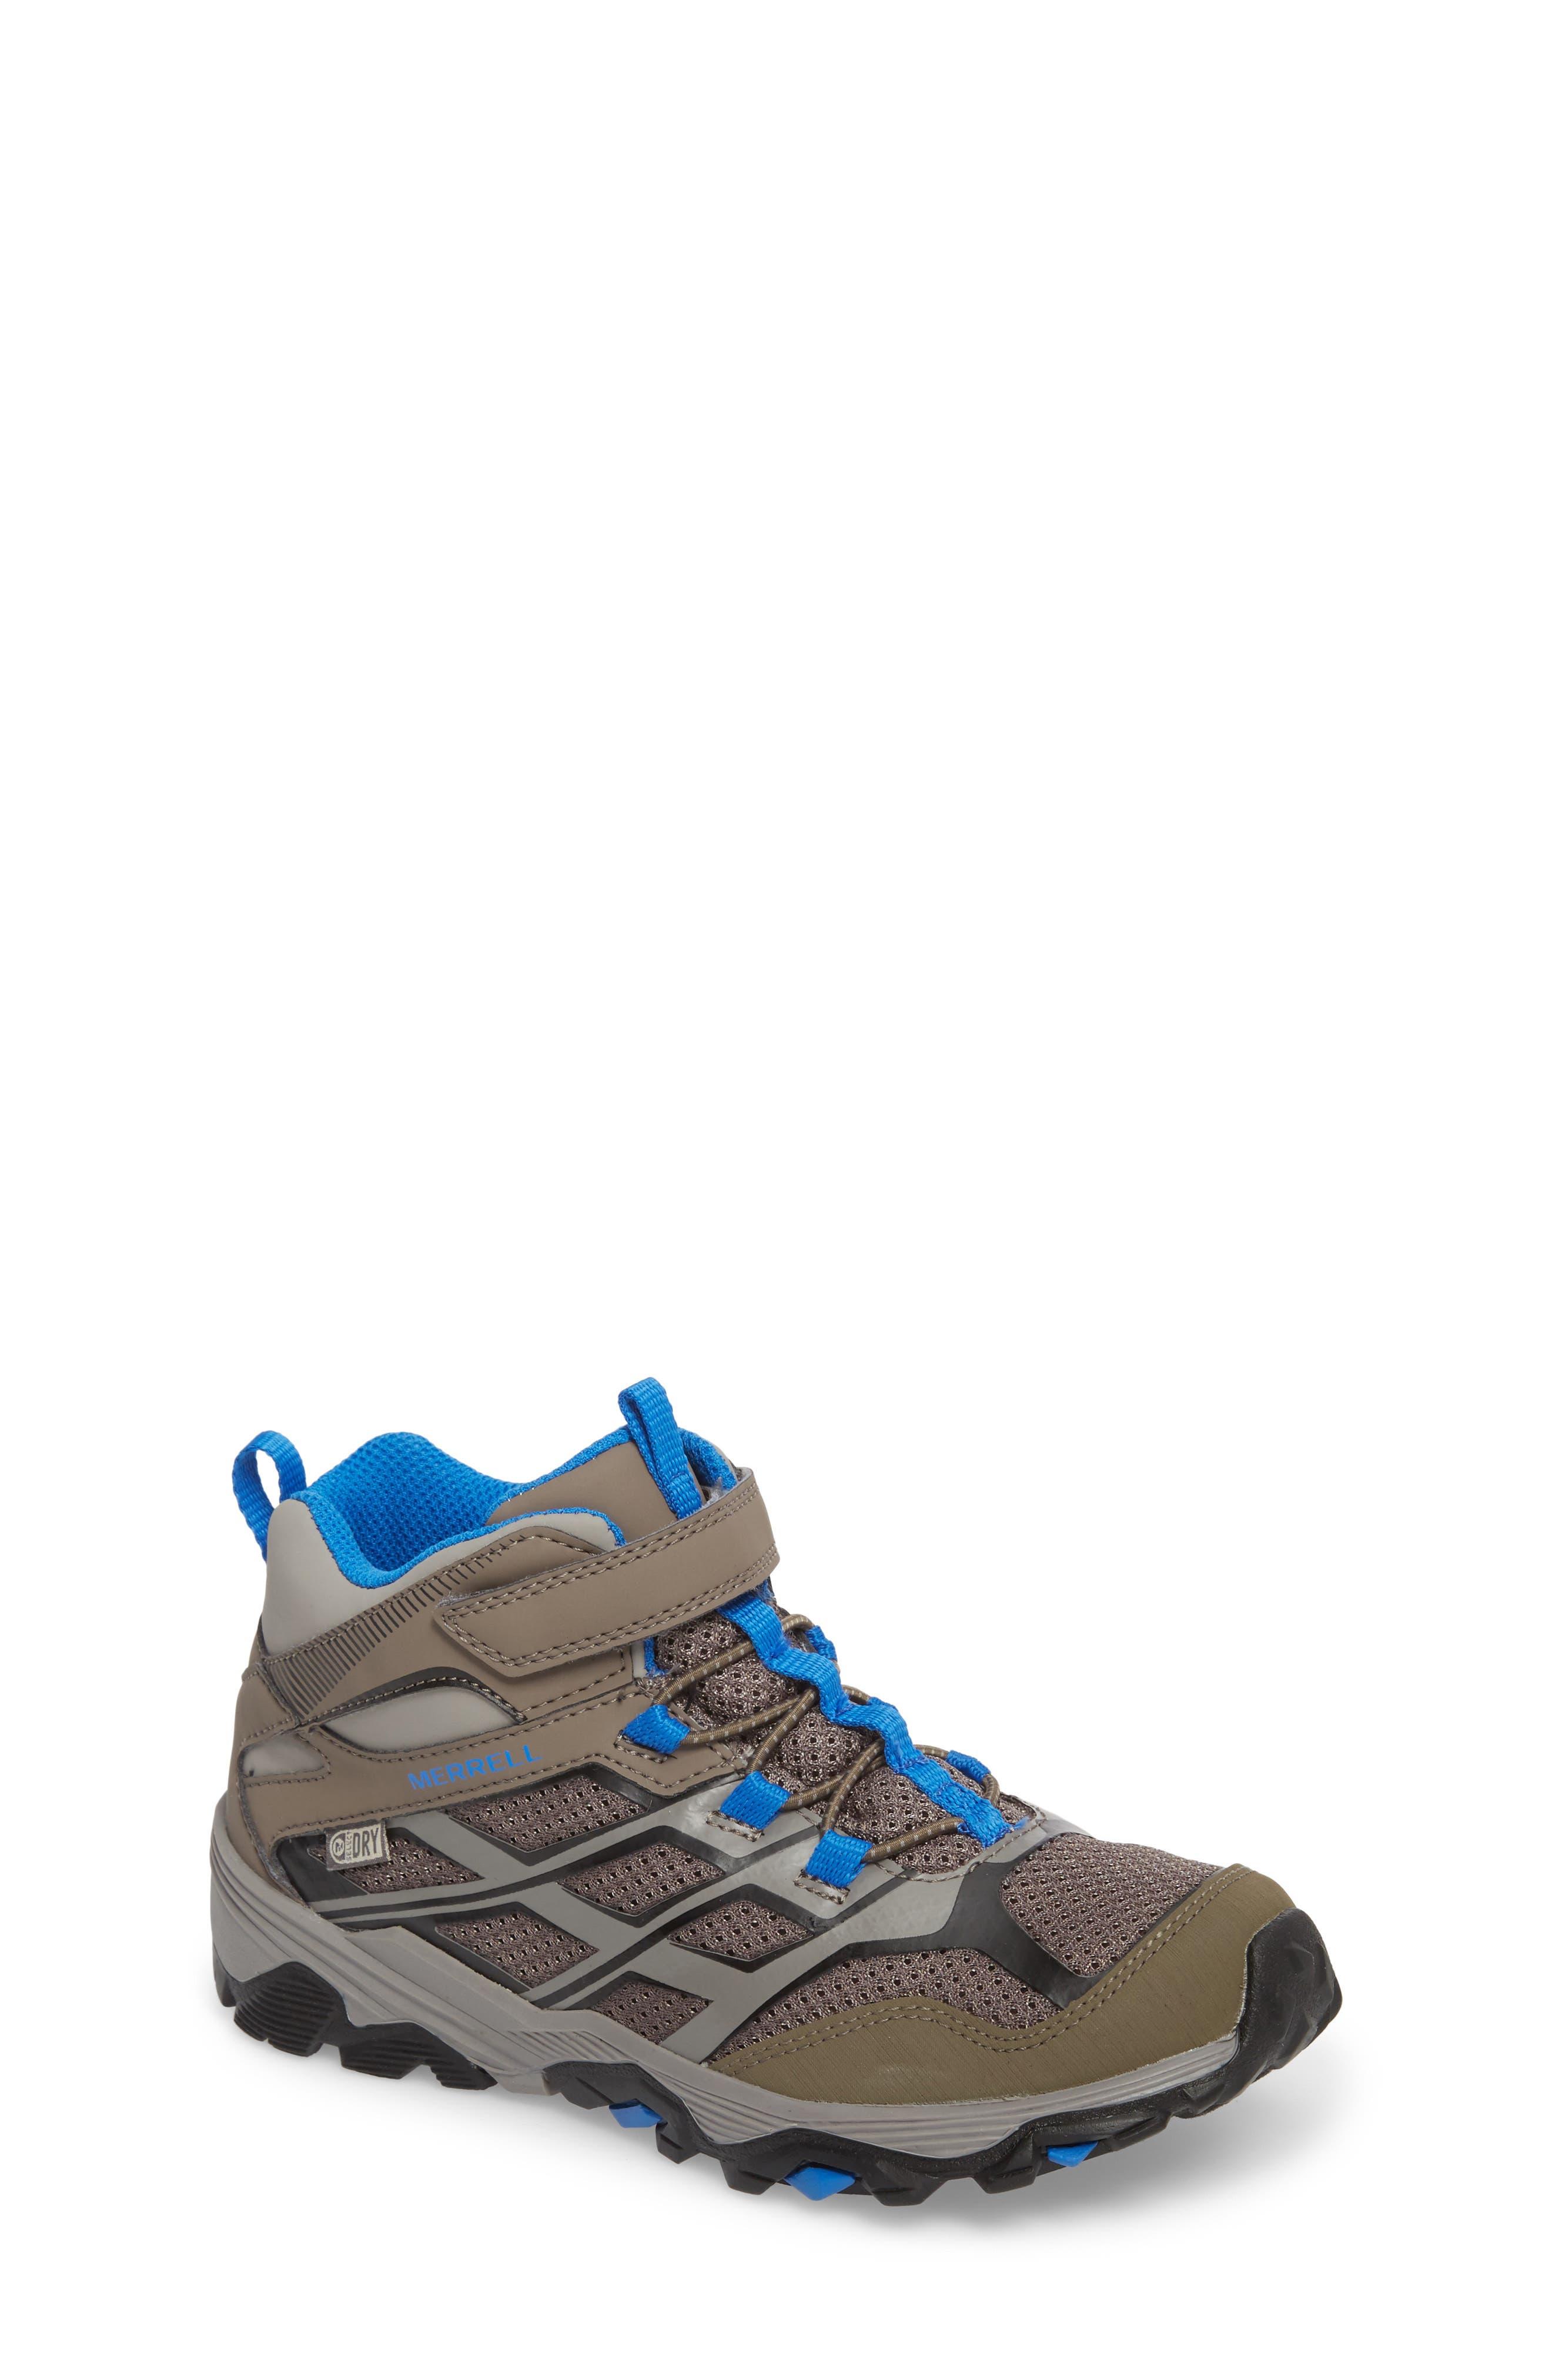 Moab FST Mid Top Waterproof Sneaker Boot,                         Main,                         color, Grey